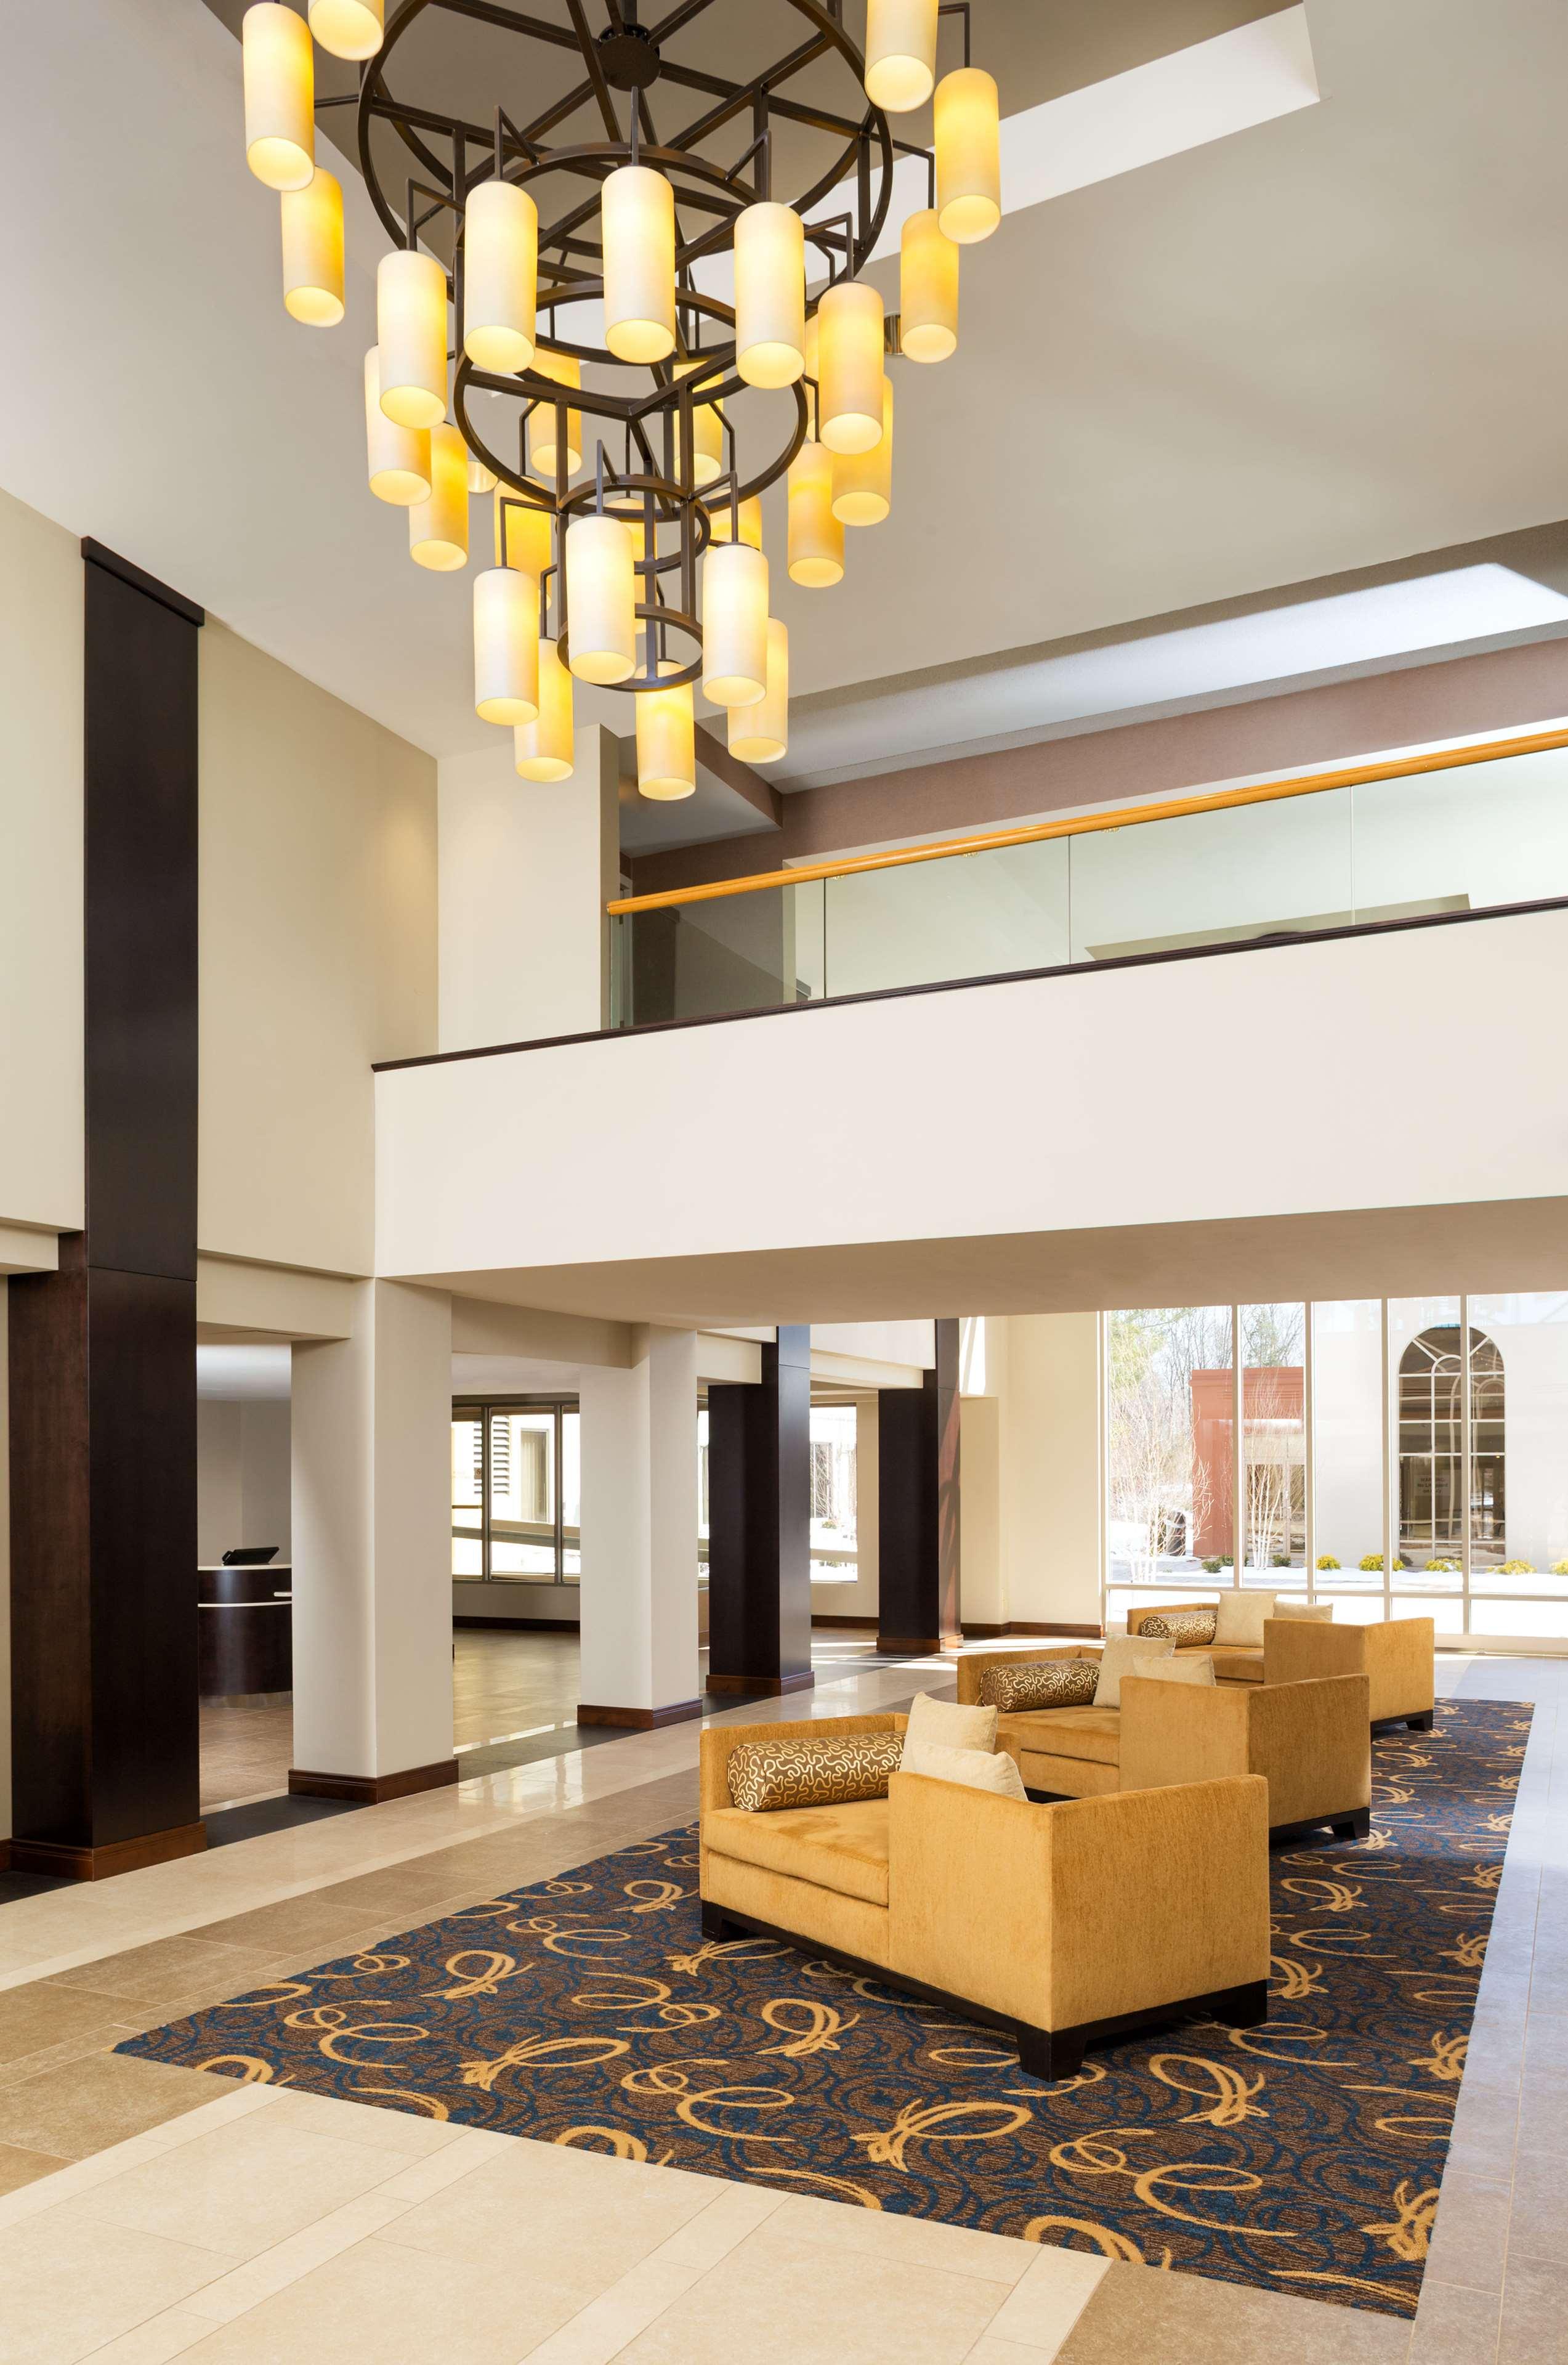 Cheap Hotels Near Waterbury Ct